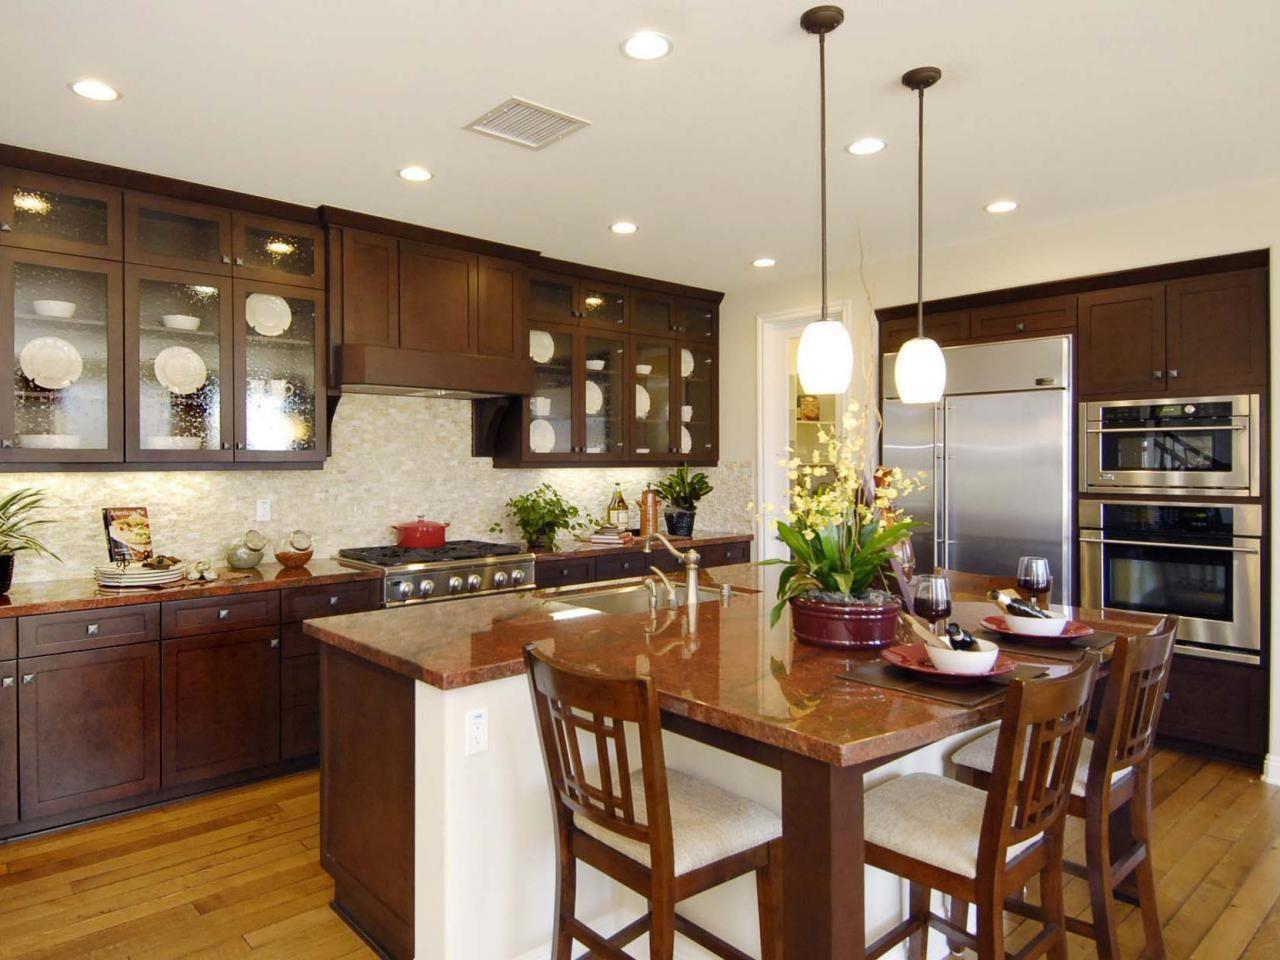 17 Kitchen Remodel On60s Kitchen. Kitchen With Black And White Cabinets. 25 Black White Kitchens Ondark. Kitchen with Dark Cabinets and White Quartz Counters